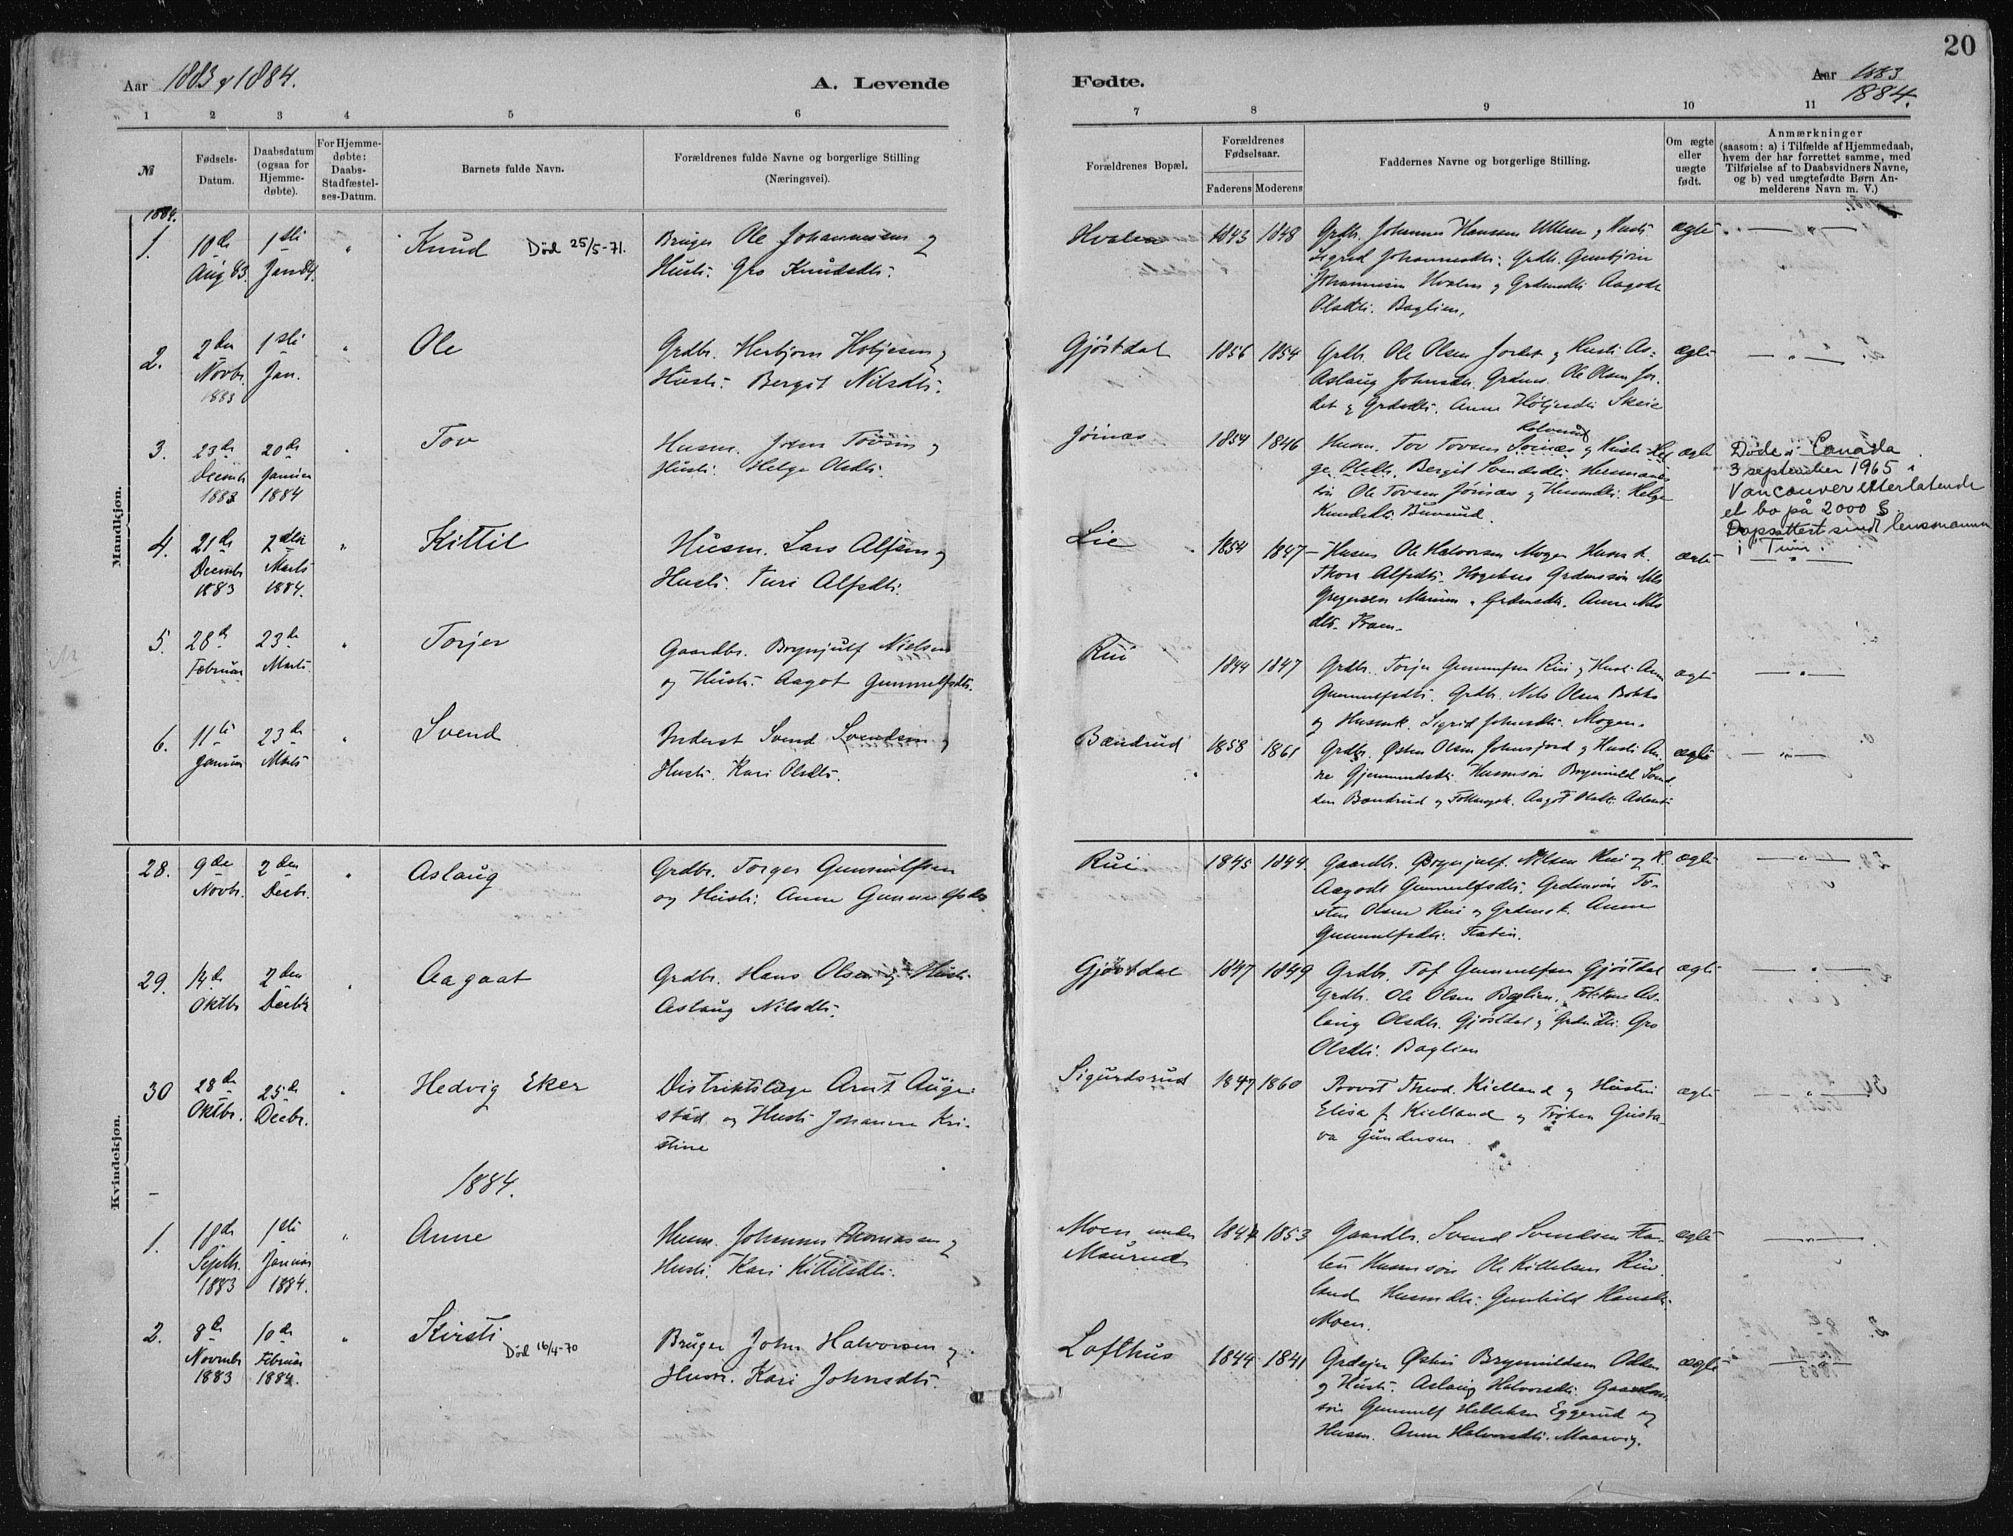 SAKO, Tinn kirkebøker, F/Fa/L0007: Ministerialbok nr. I 7, 1878-1922, s. 20